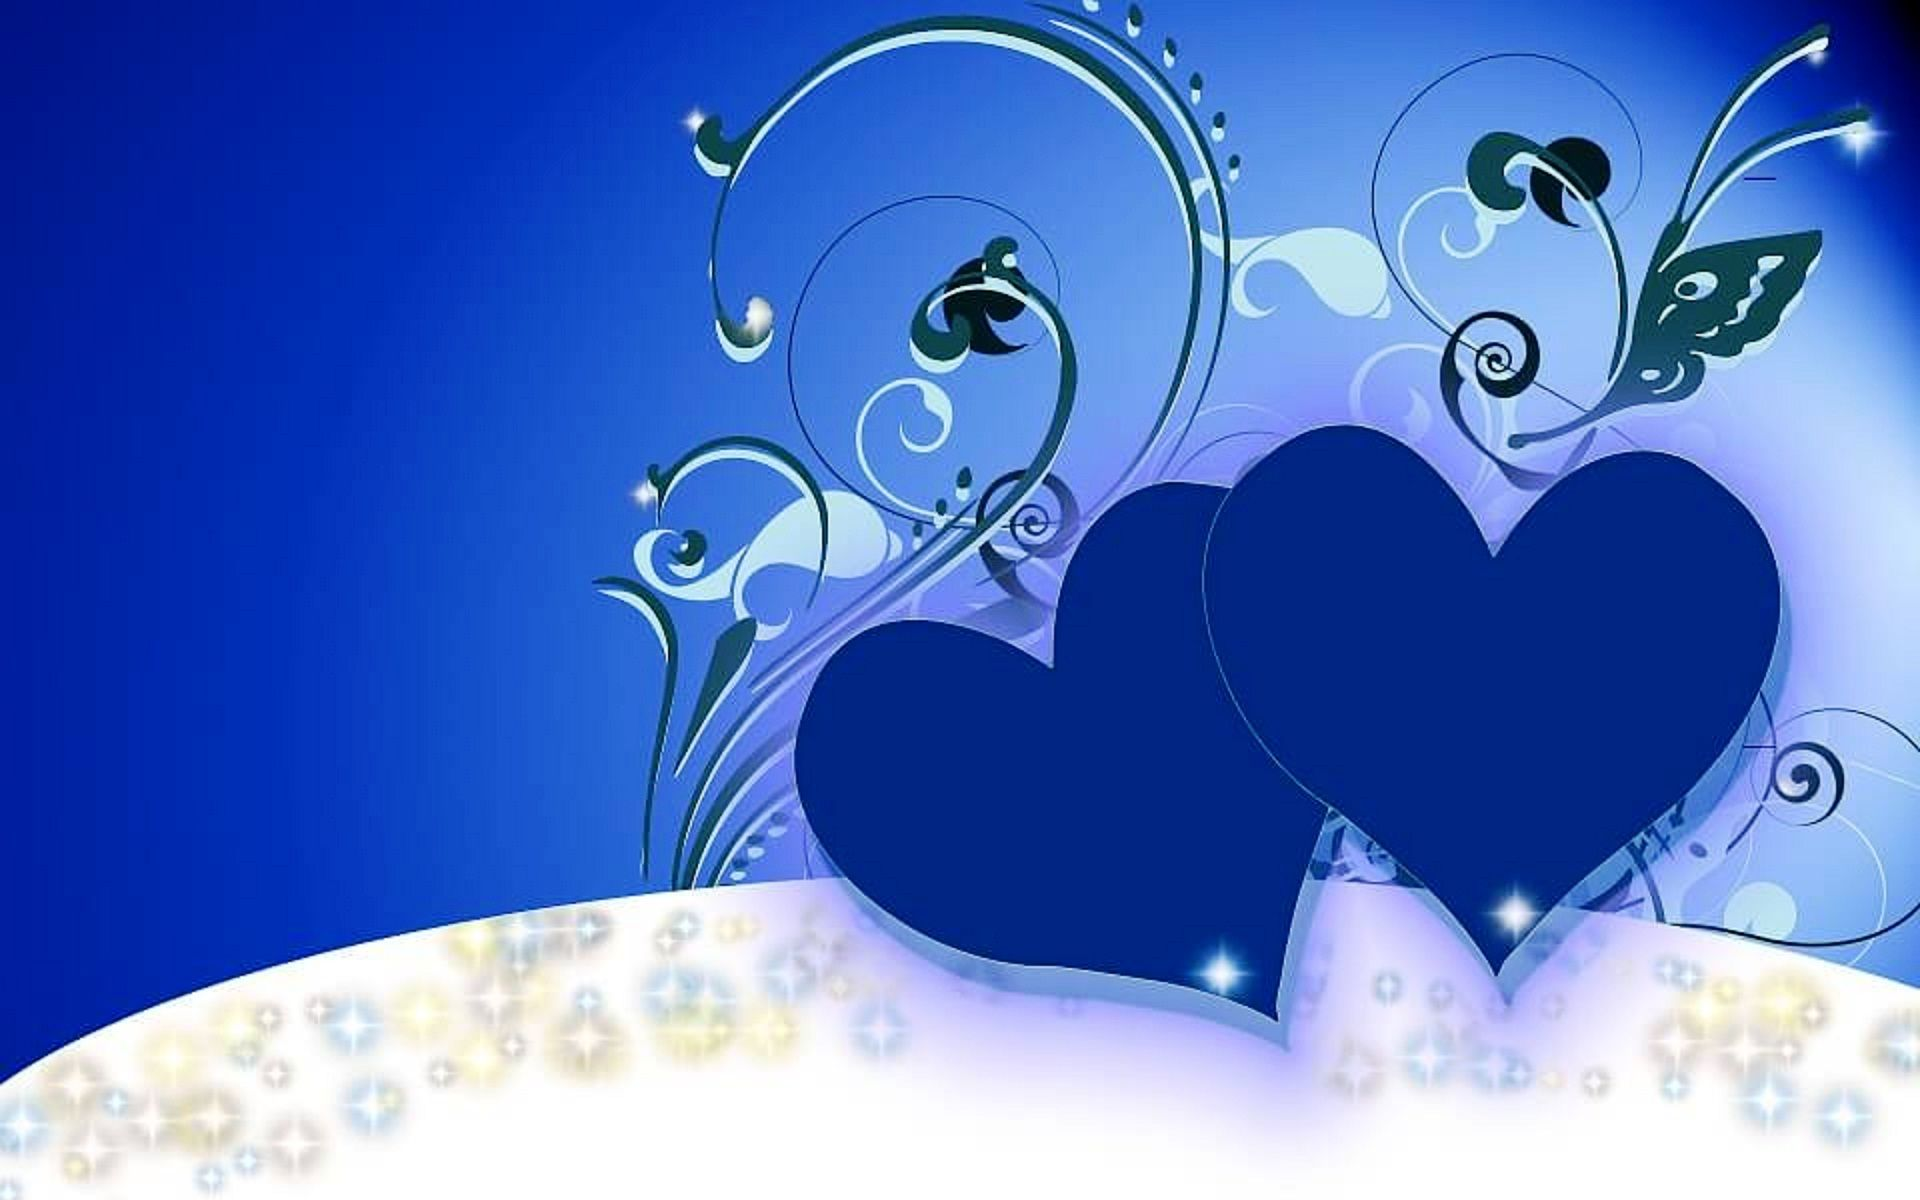 superb abstract design heart